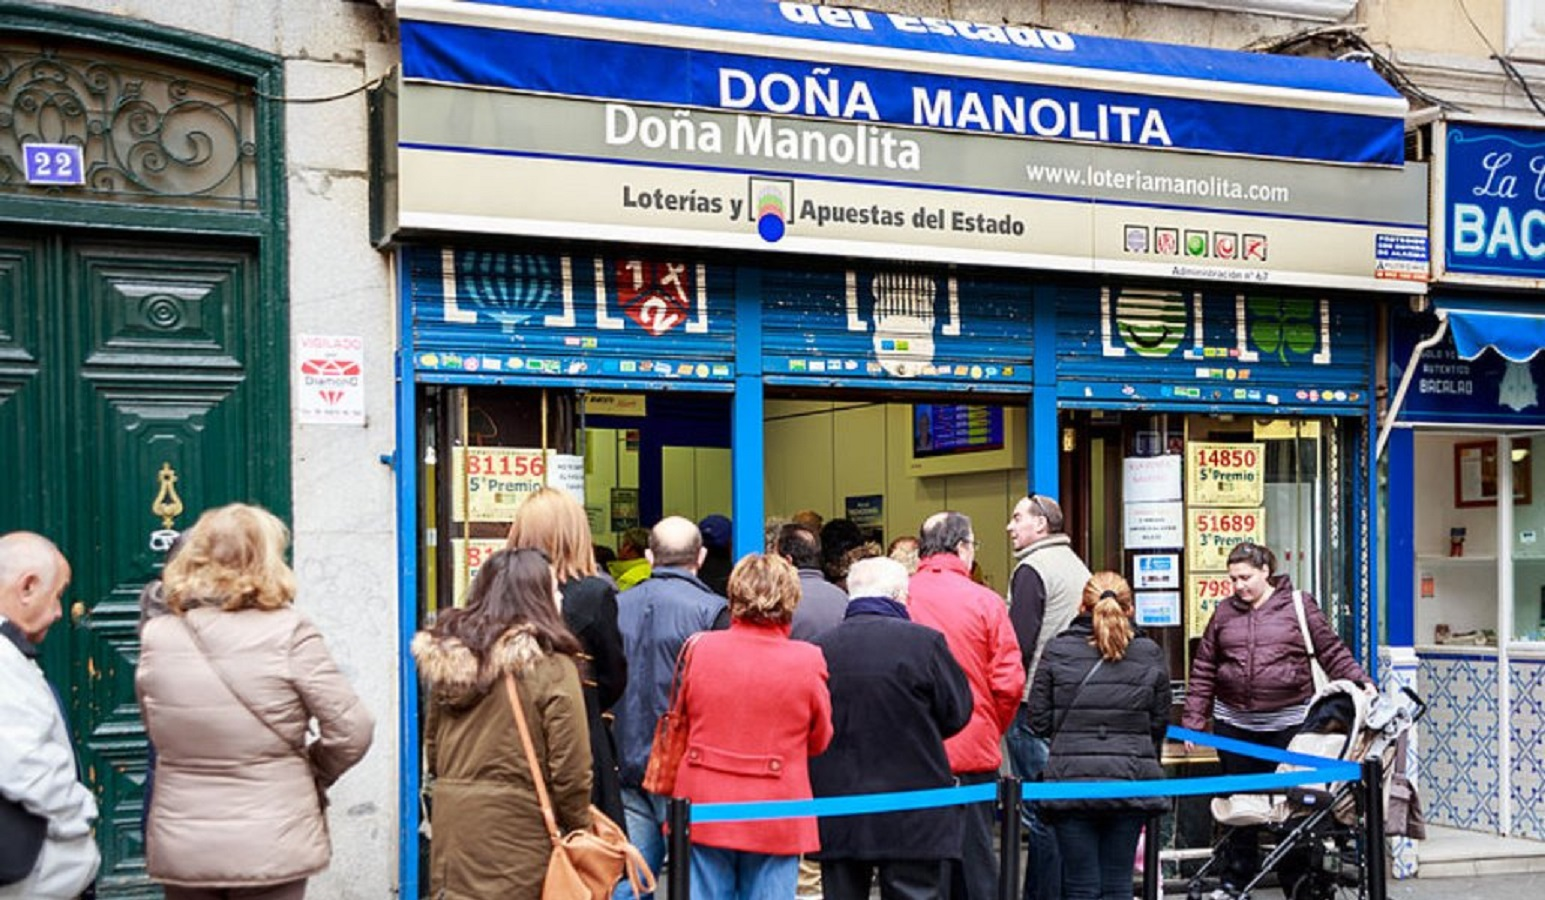 navidad-madrid-dona-manolita-loteria